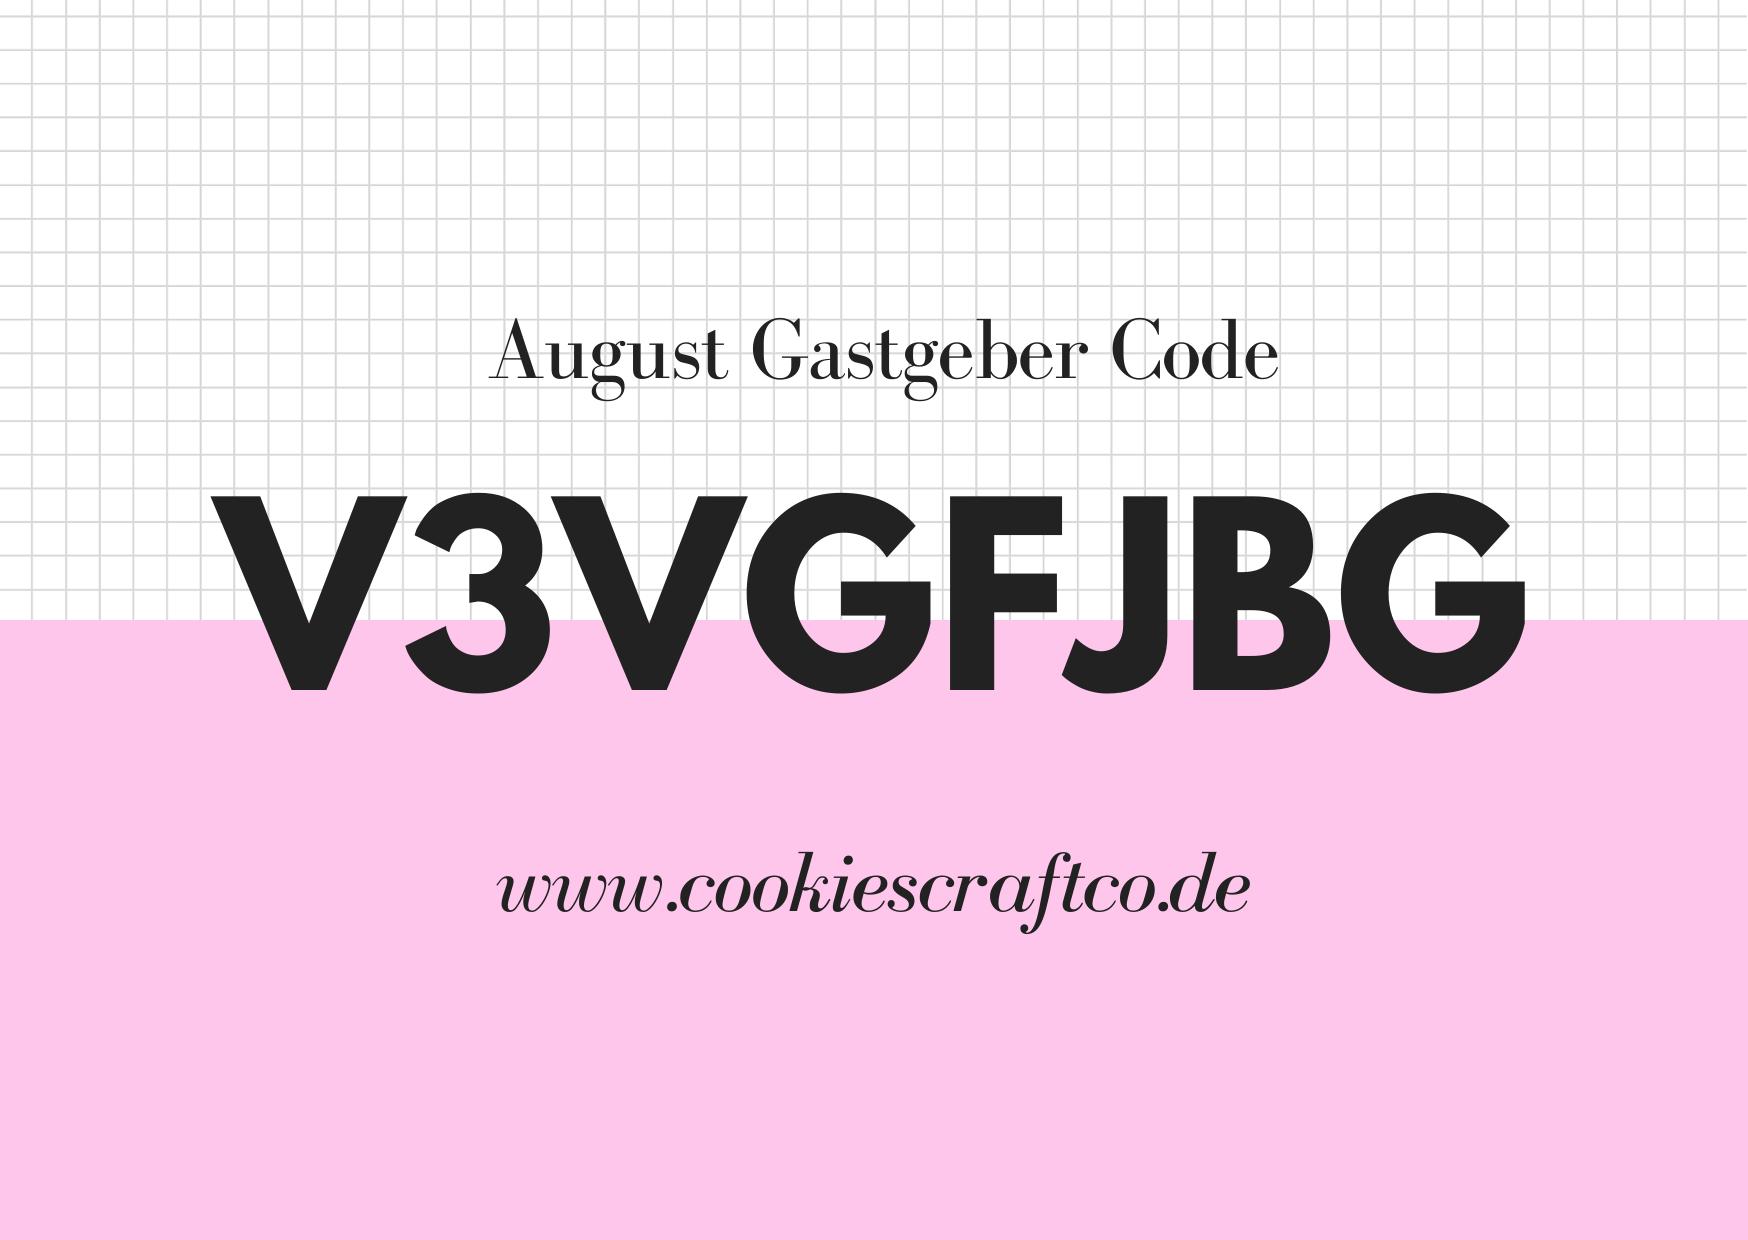 August - Gastgeberinnencode V3VGFJBG